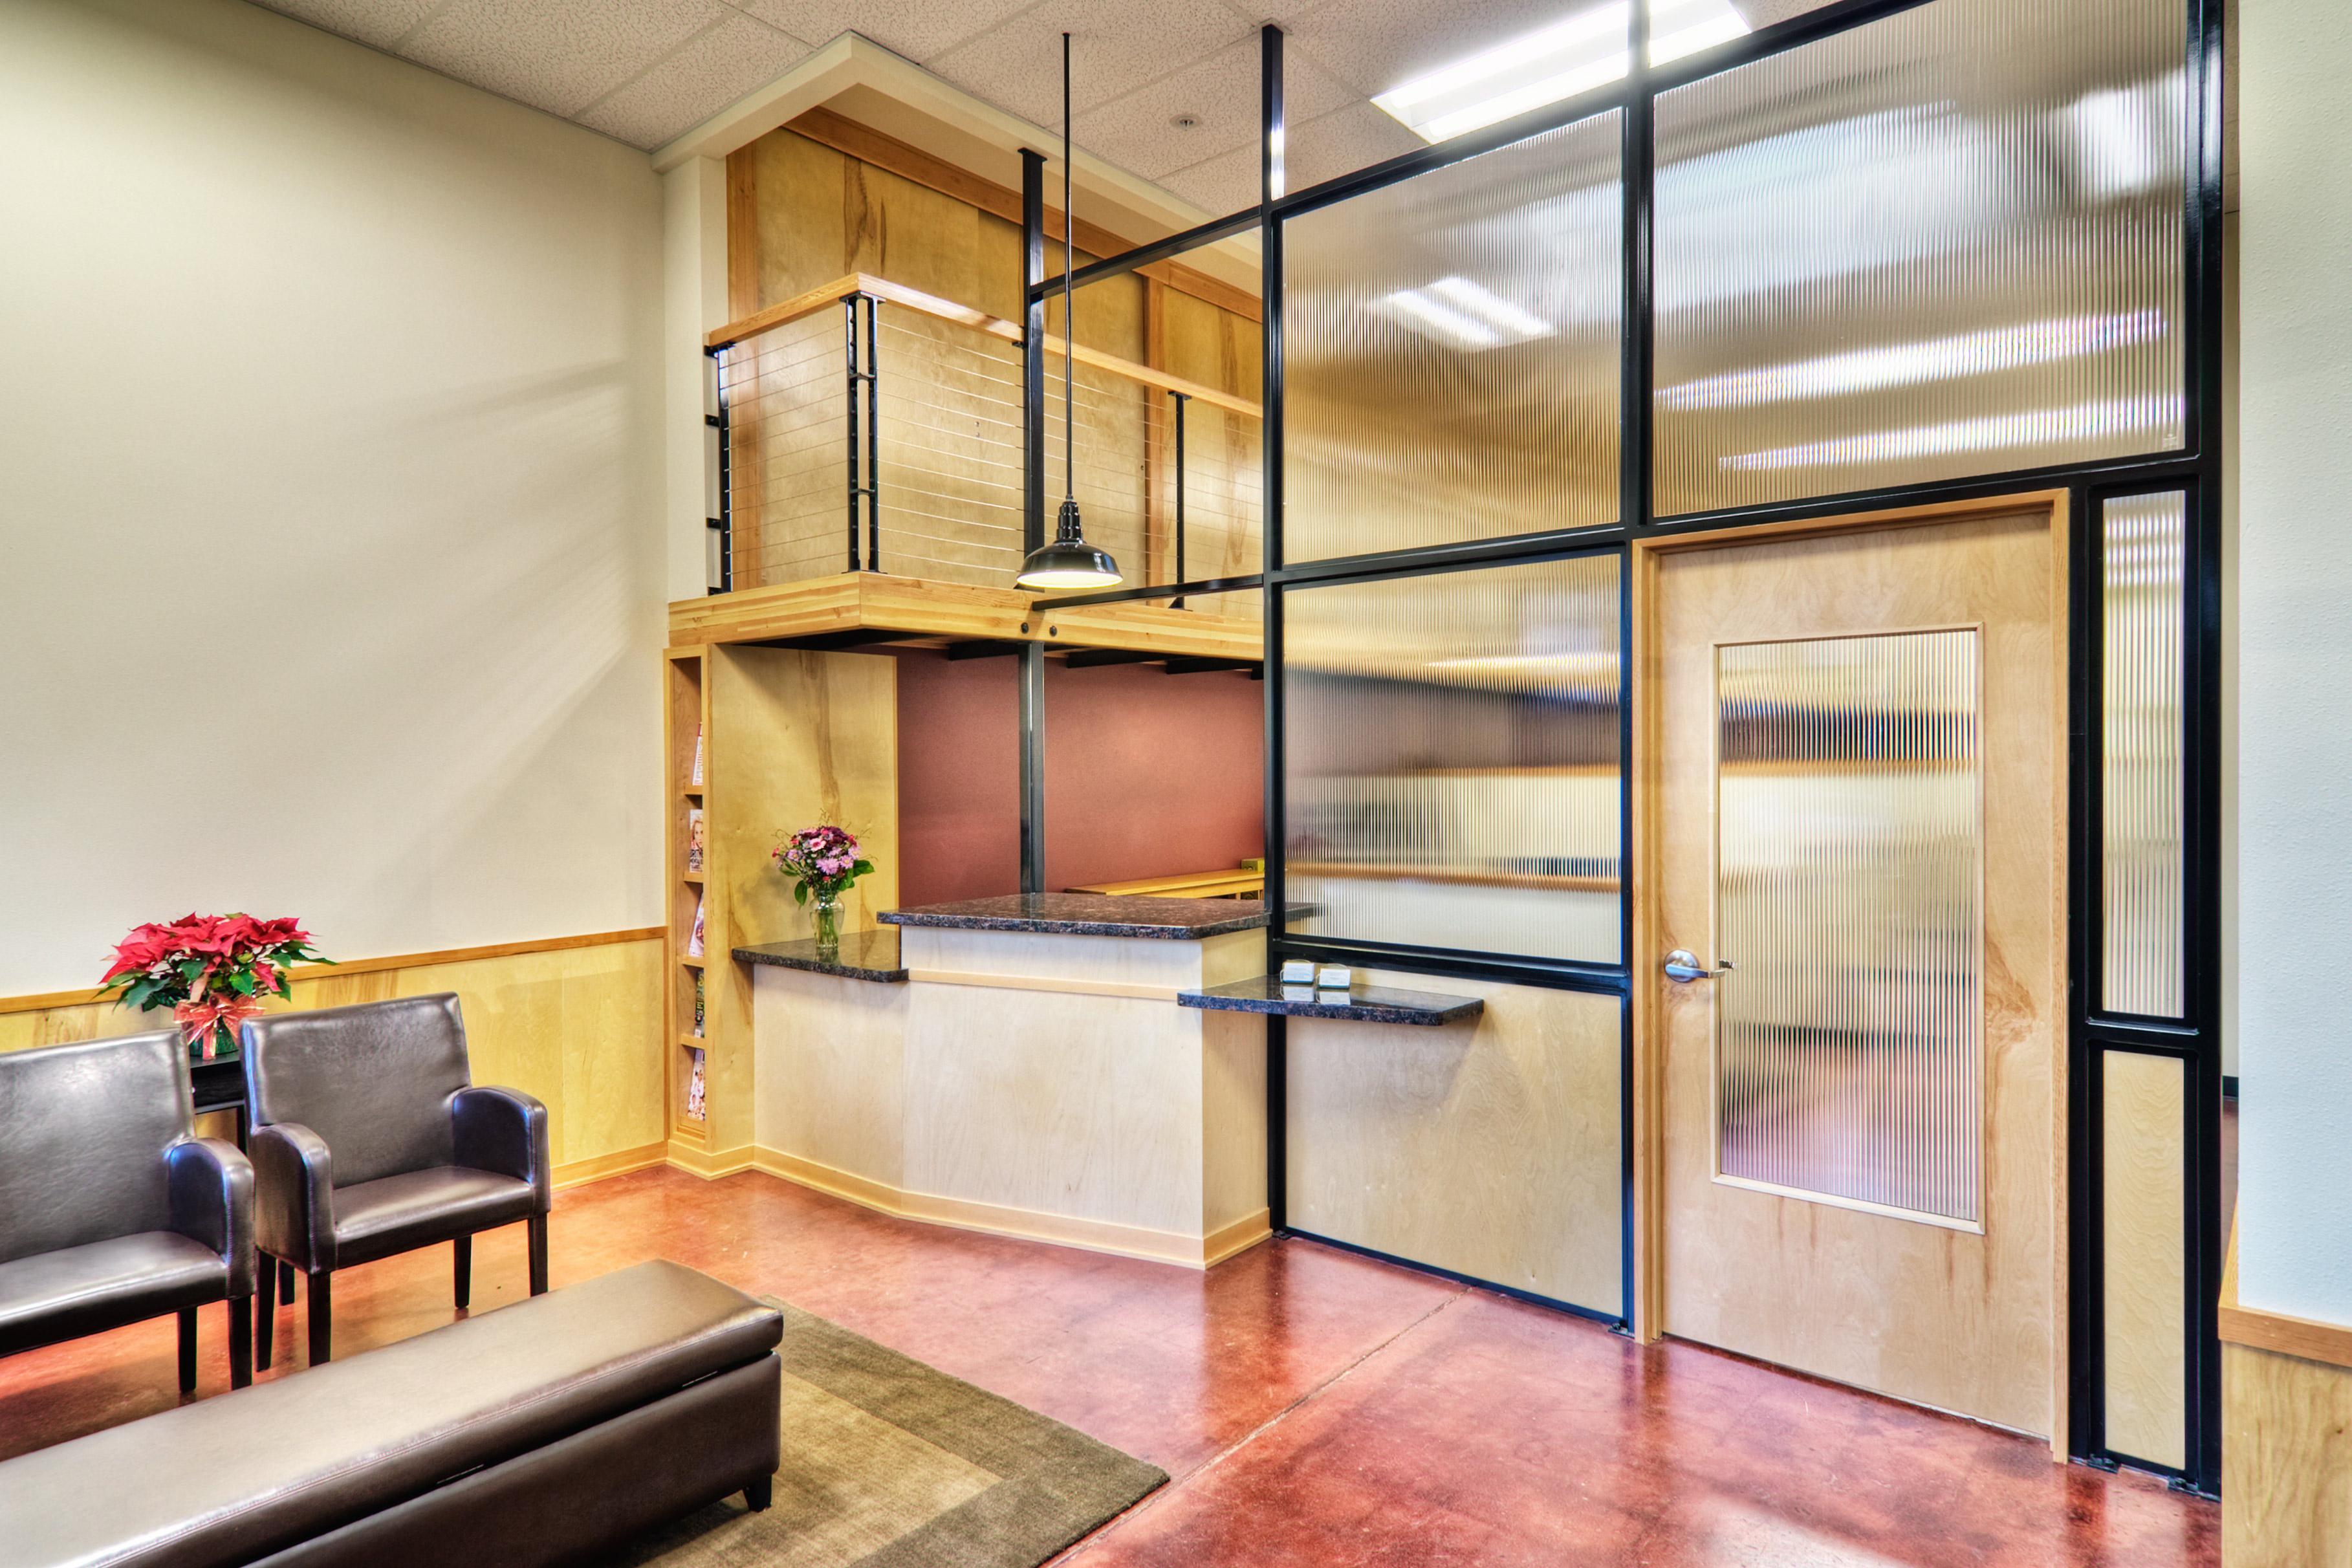 duvall-interior-lobby | Nir Pearlson Architect